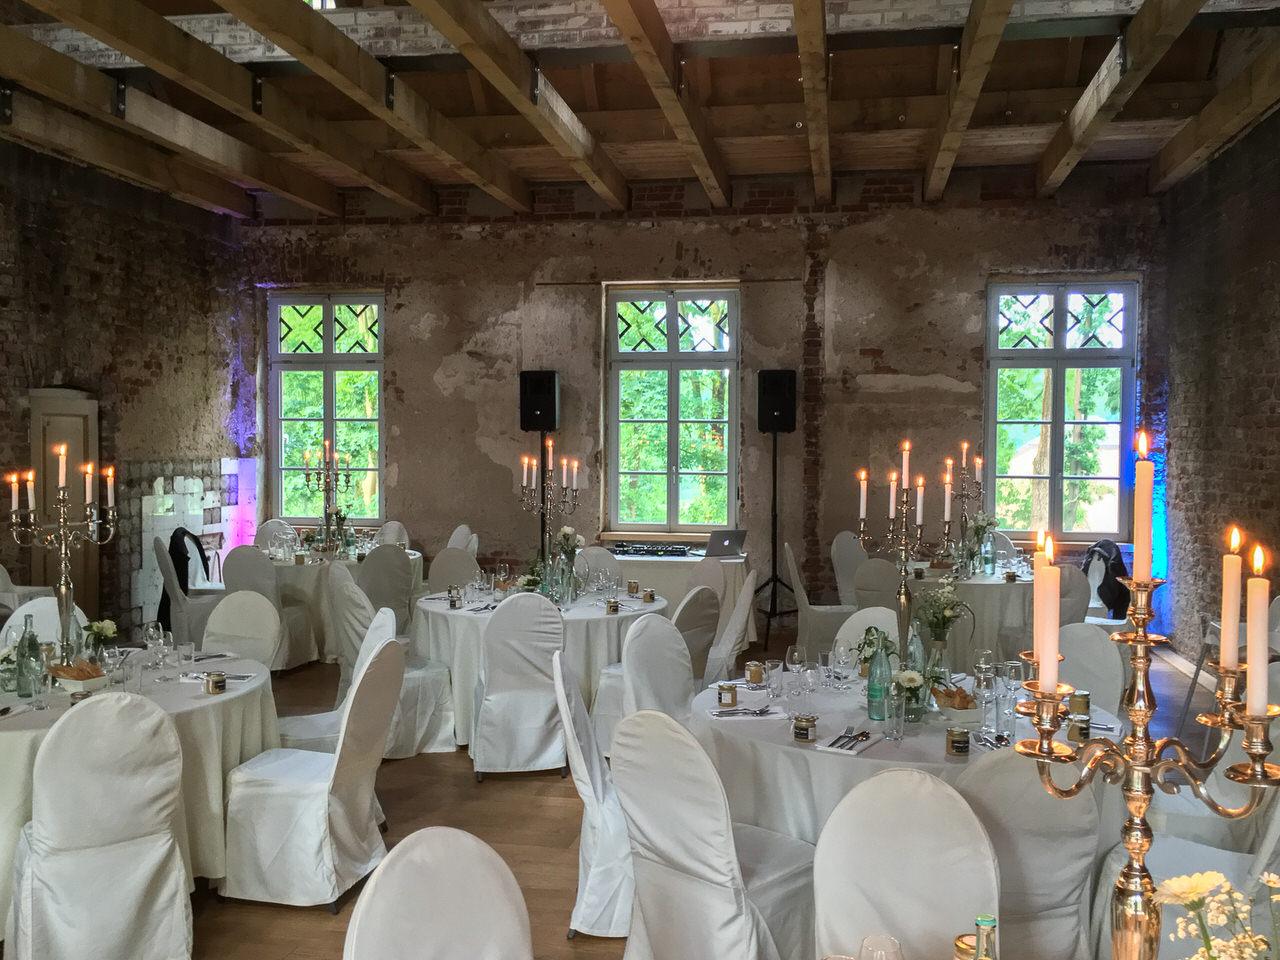 Der Festsaal im Rittergut Orr. Foto: Andreas Paul